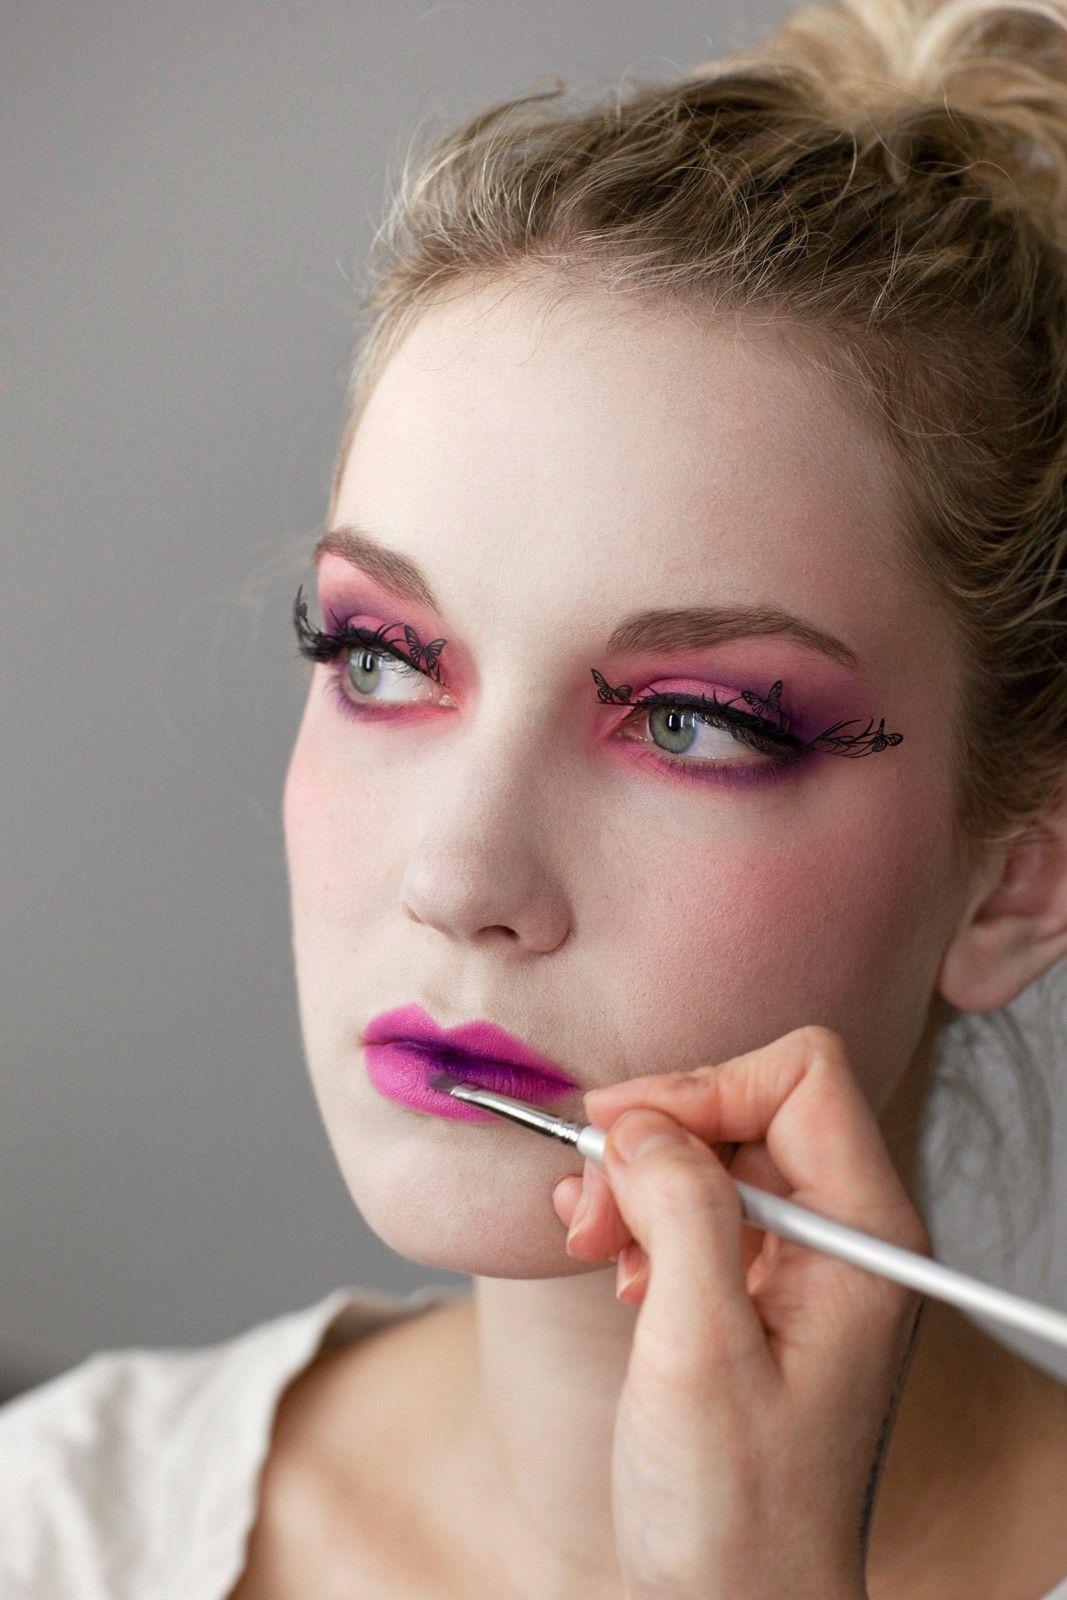 Effie Trinket Makeup Tutorial from the hunger games. I